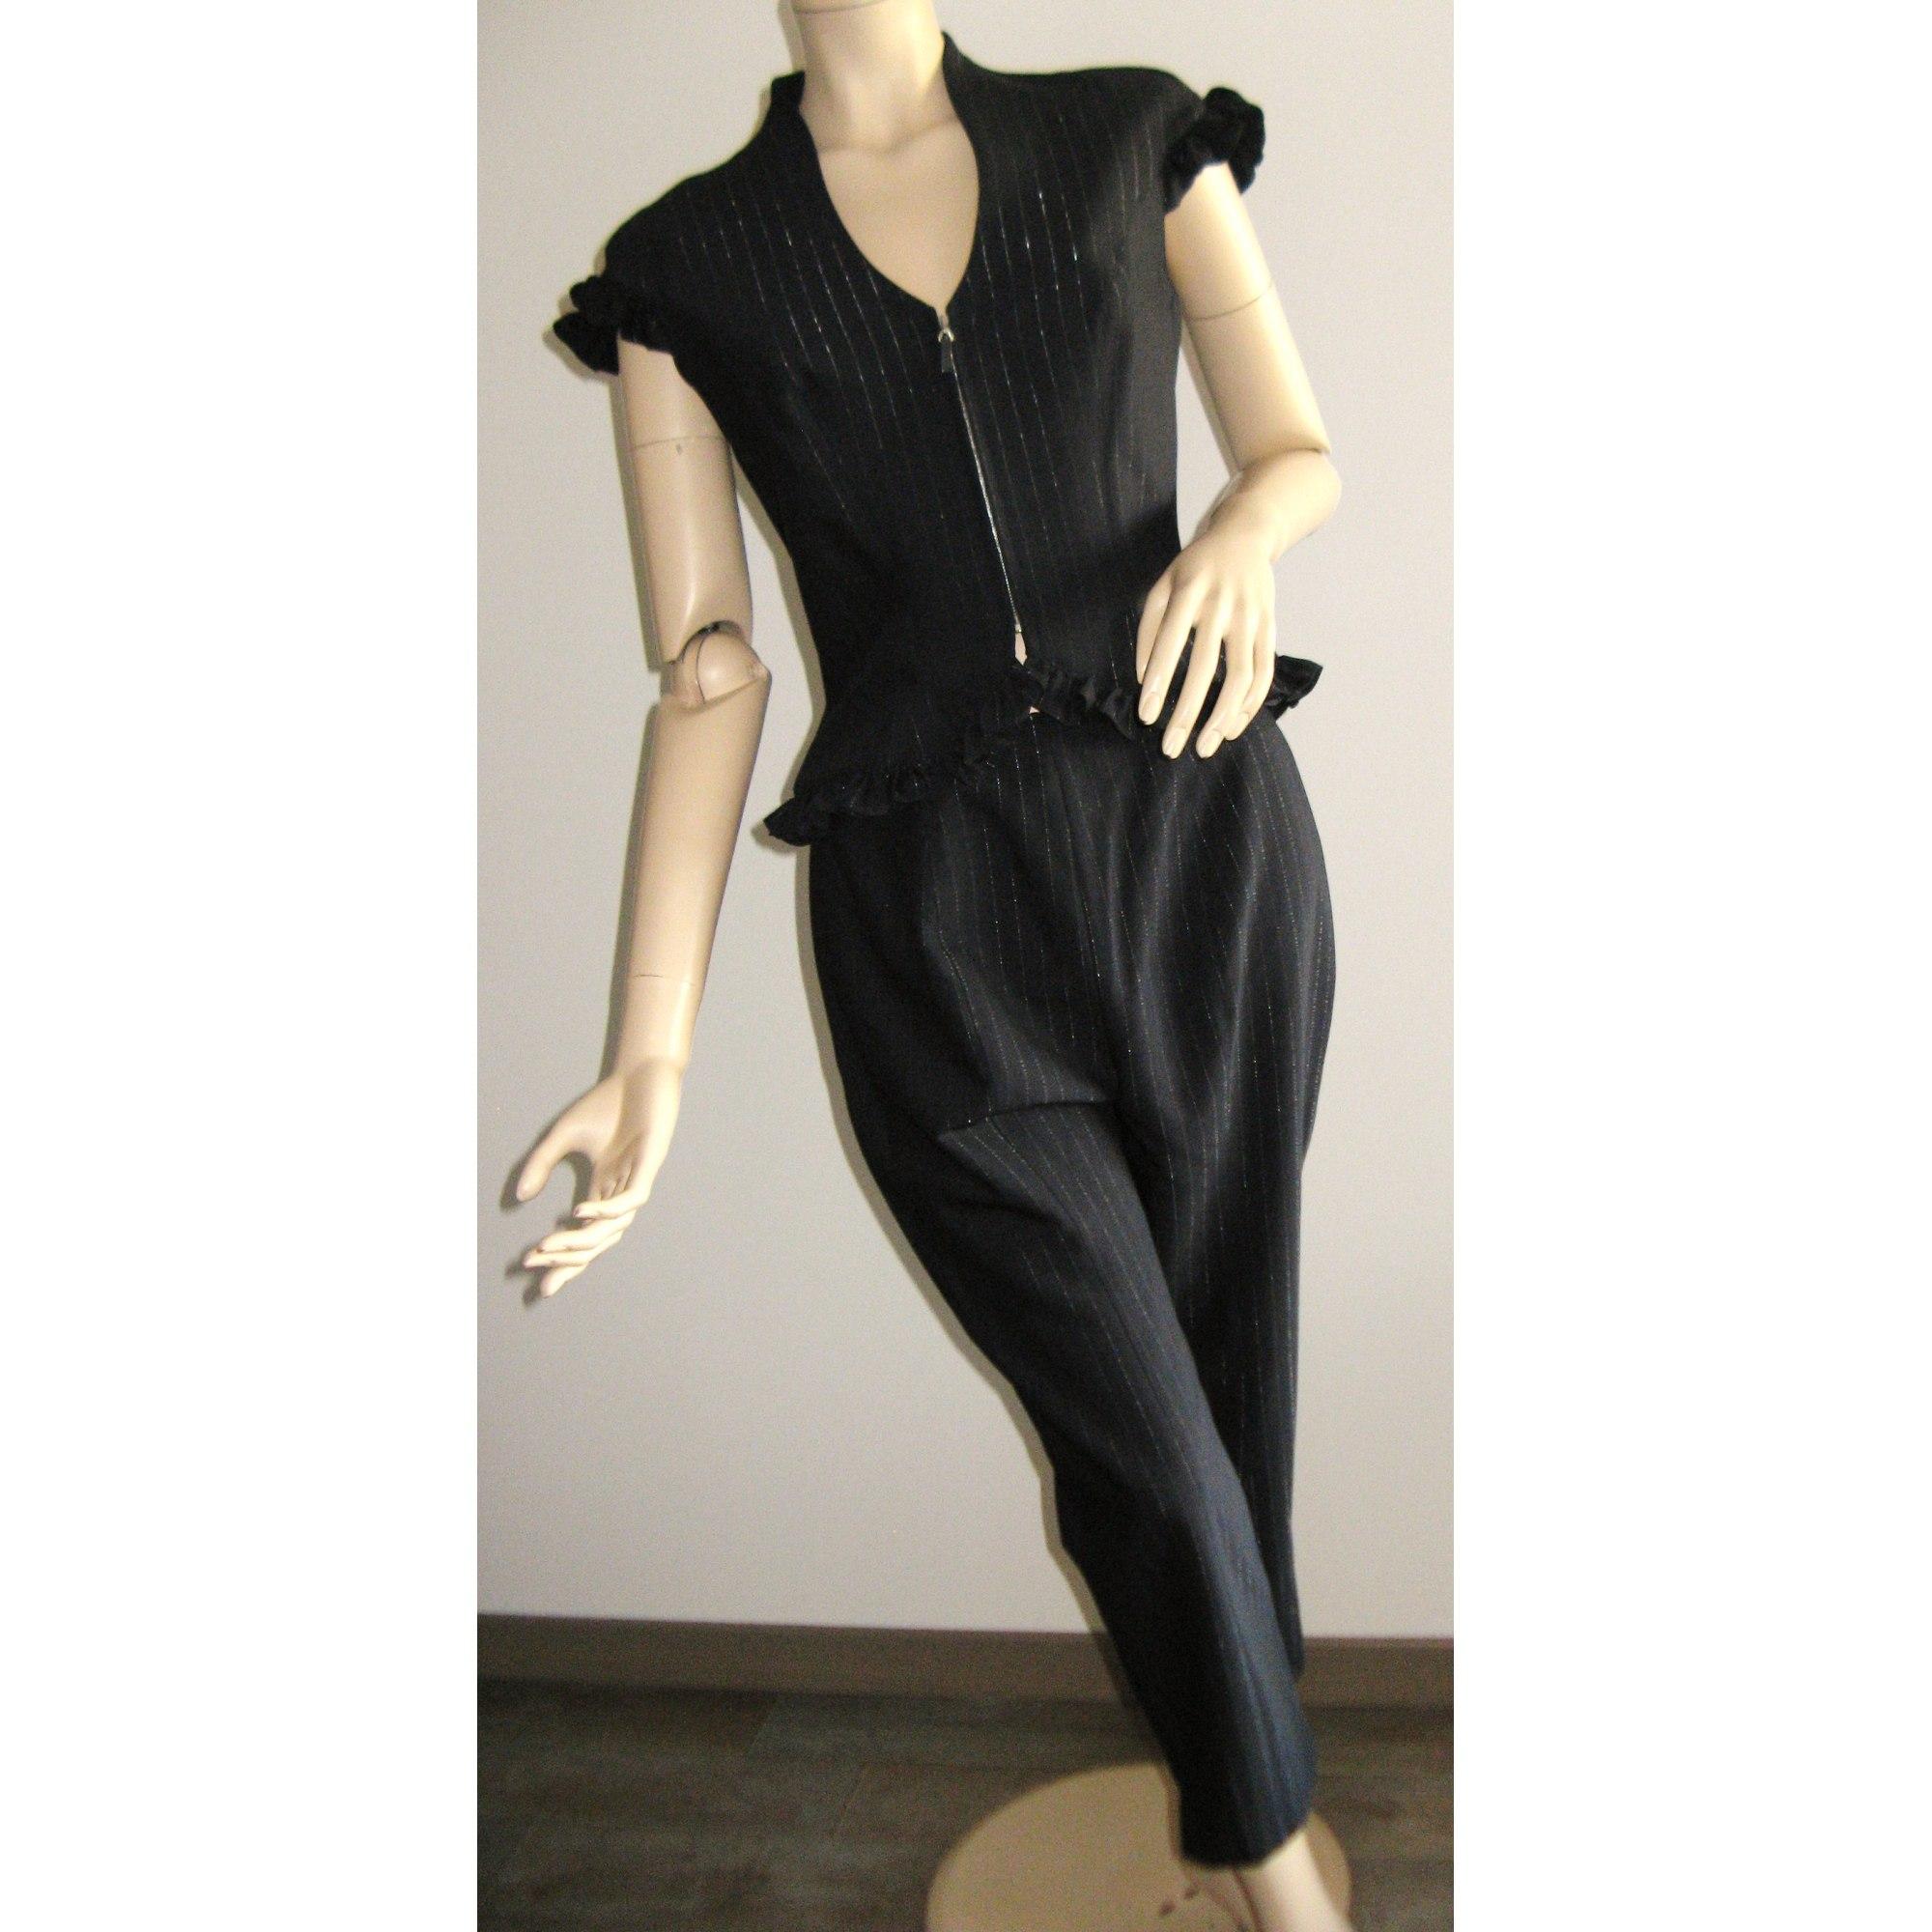 c4f1eb6e41c Tailleur pantalon THIERRY MUGLER 38 (M